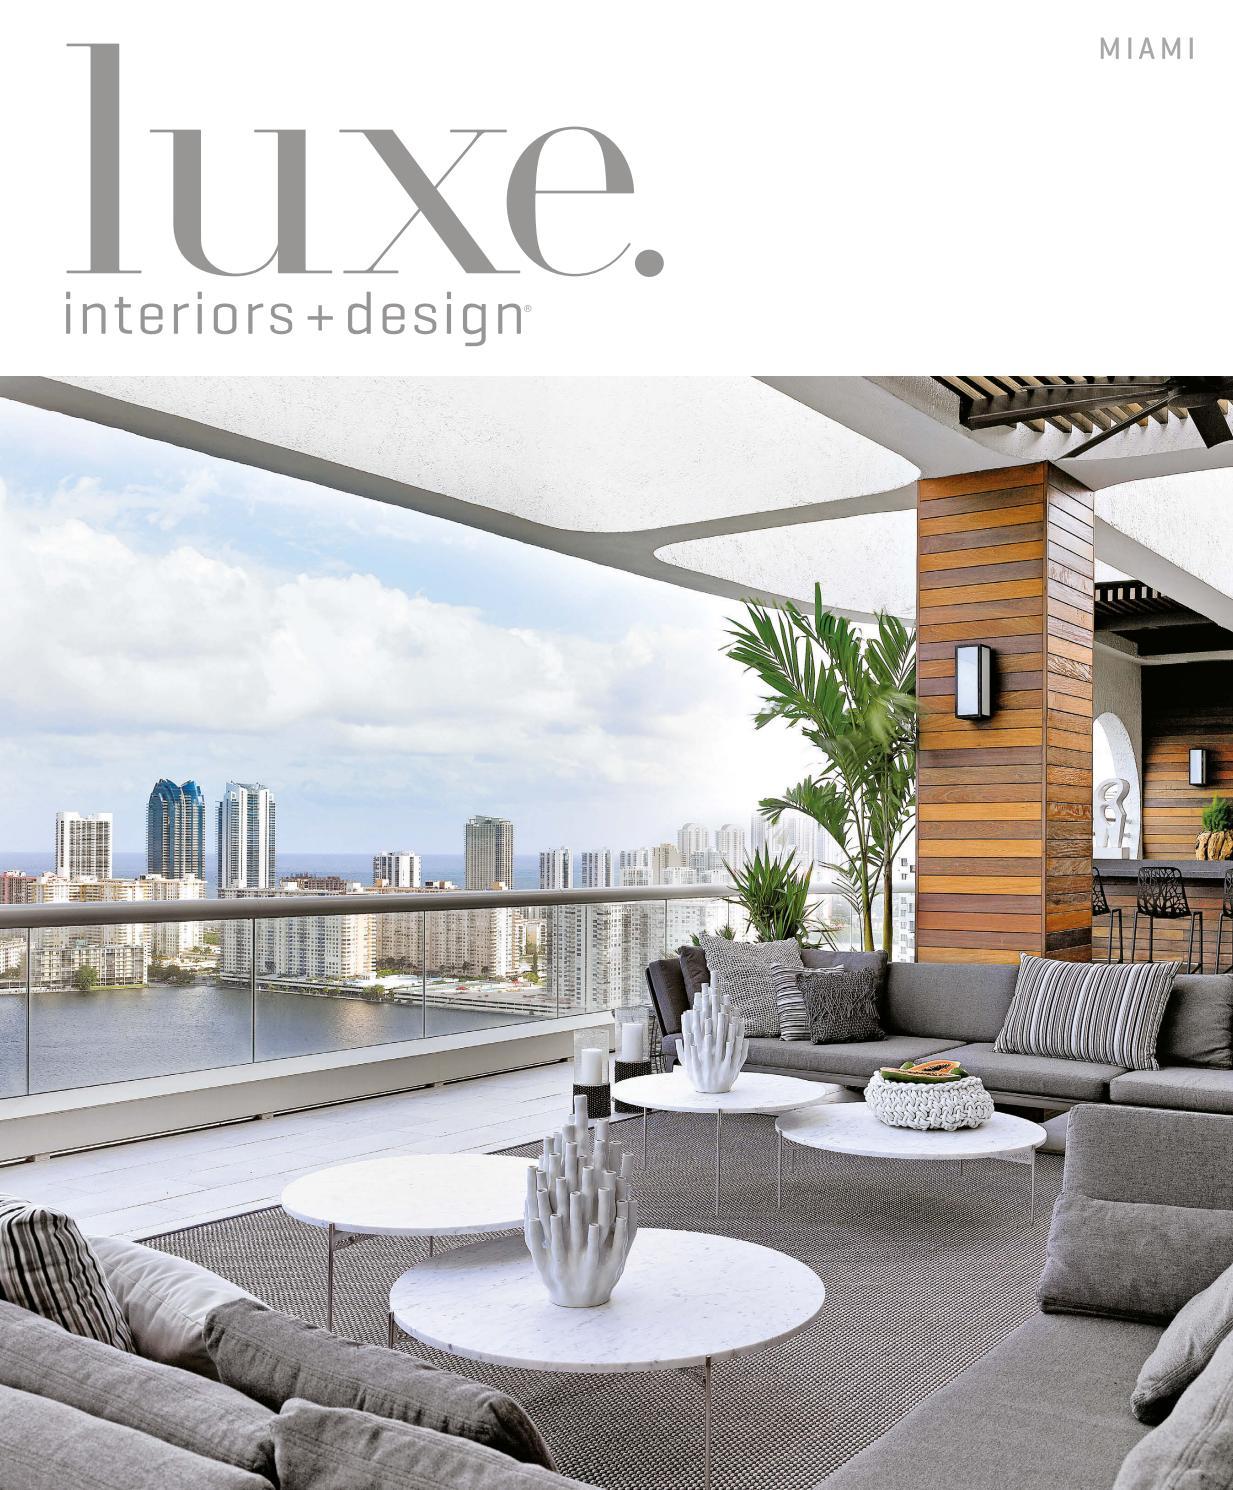 luxe magazine september 2016 miami by sandow media llc issuu